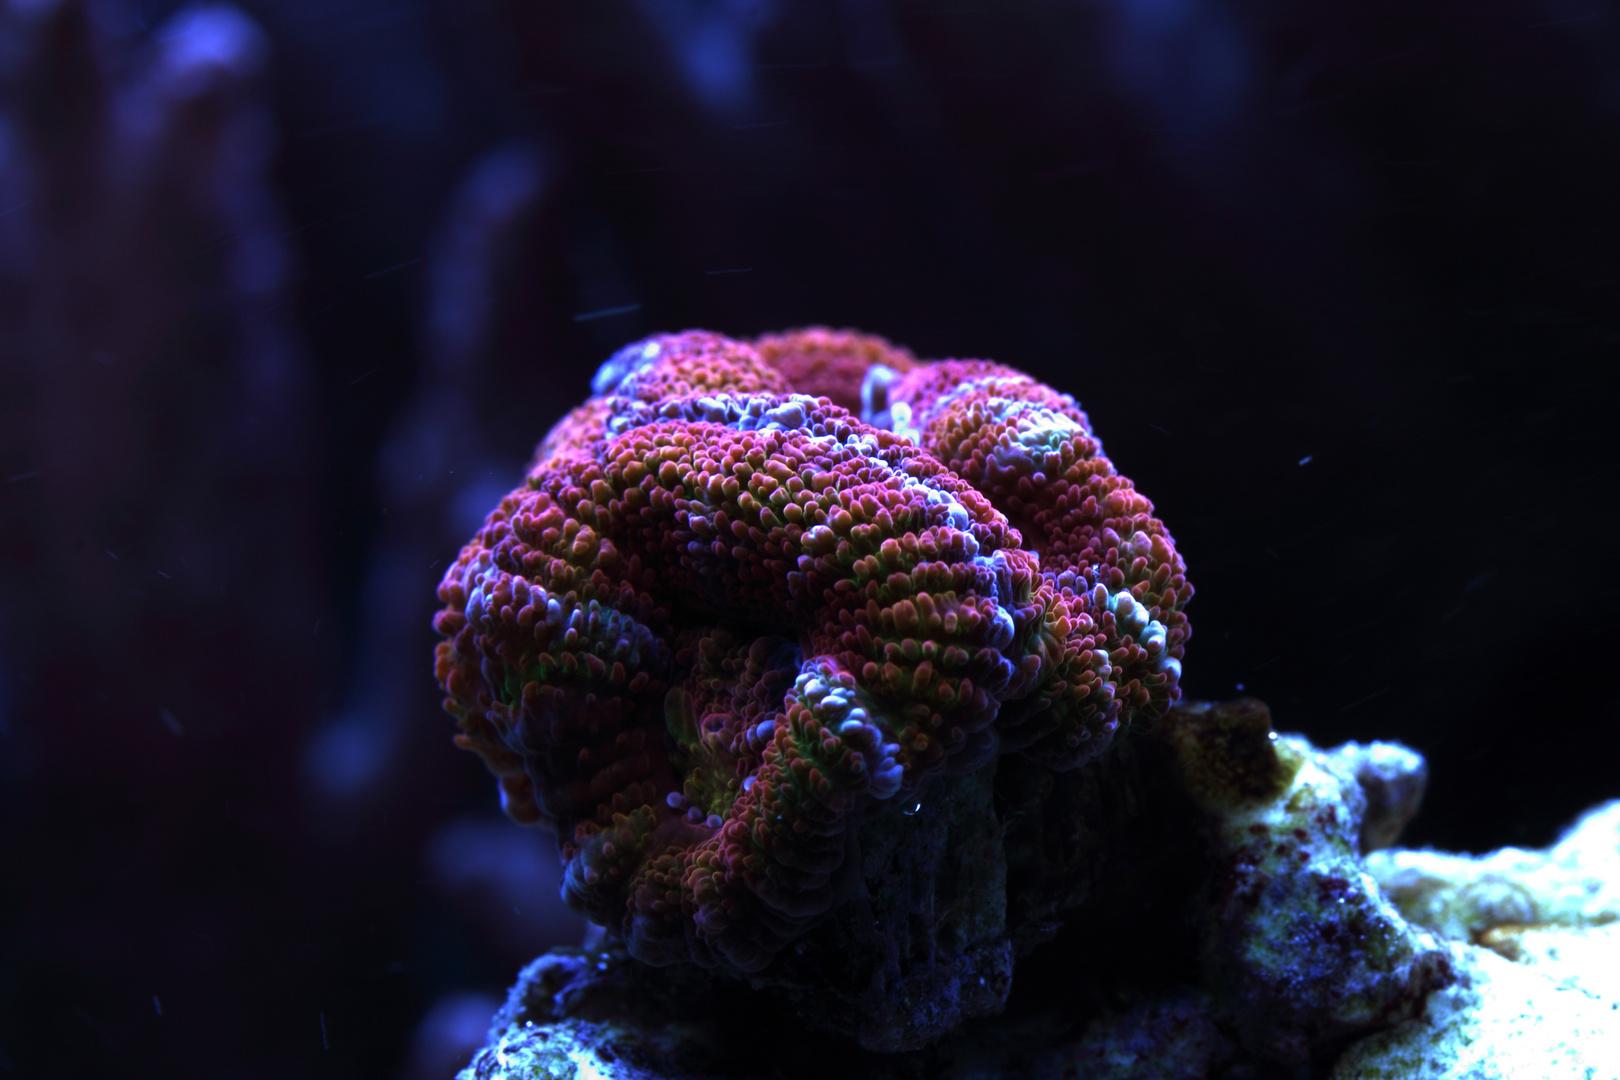 Acanthastrea lordhowensis